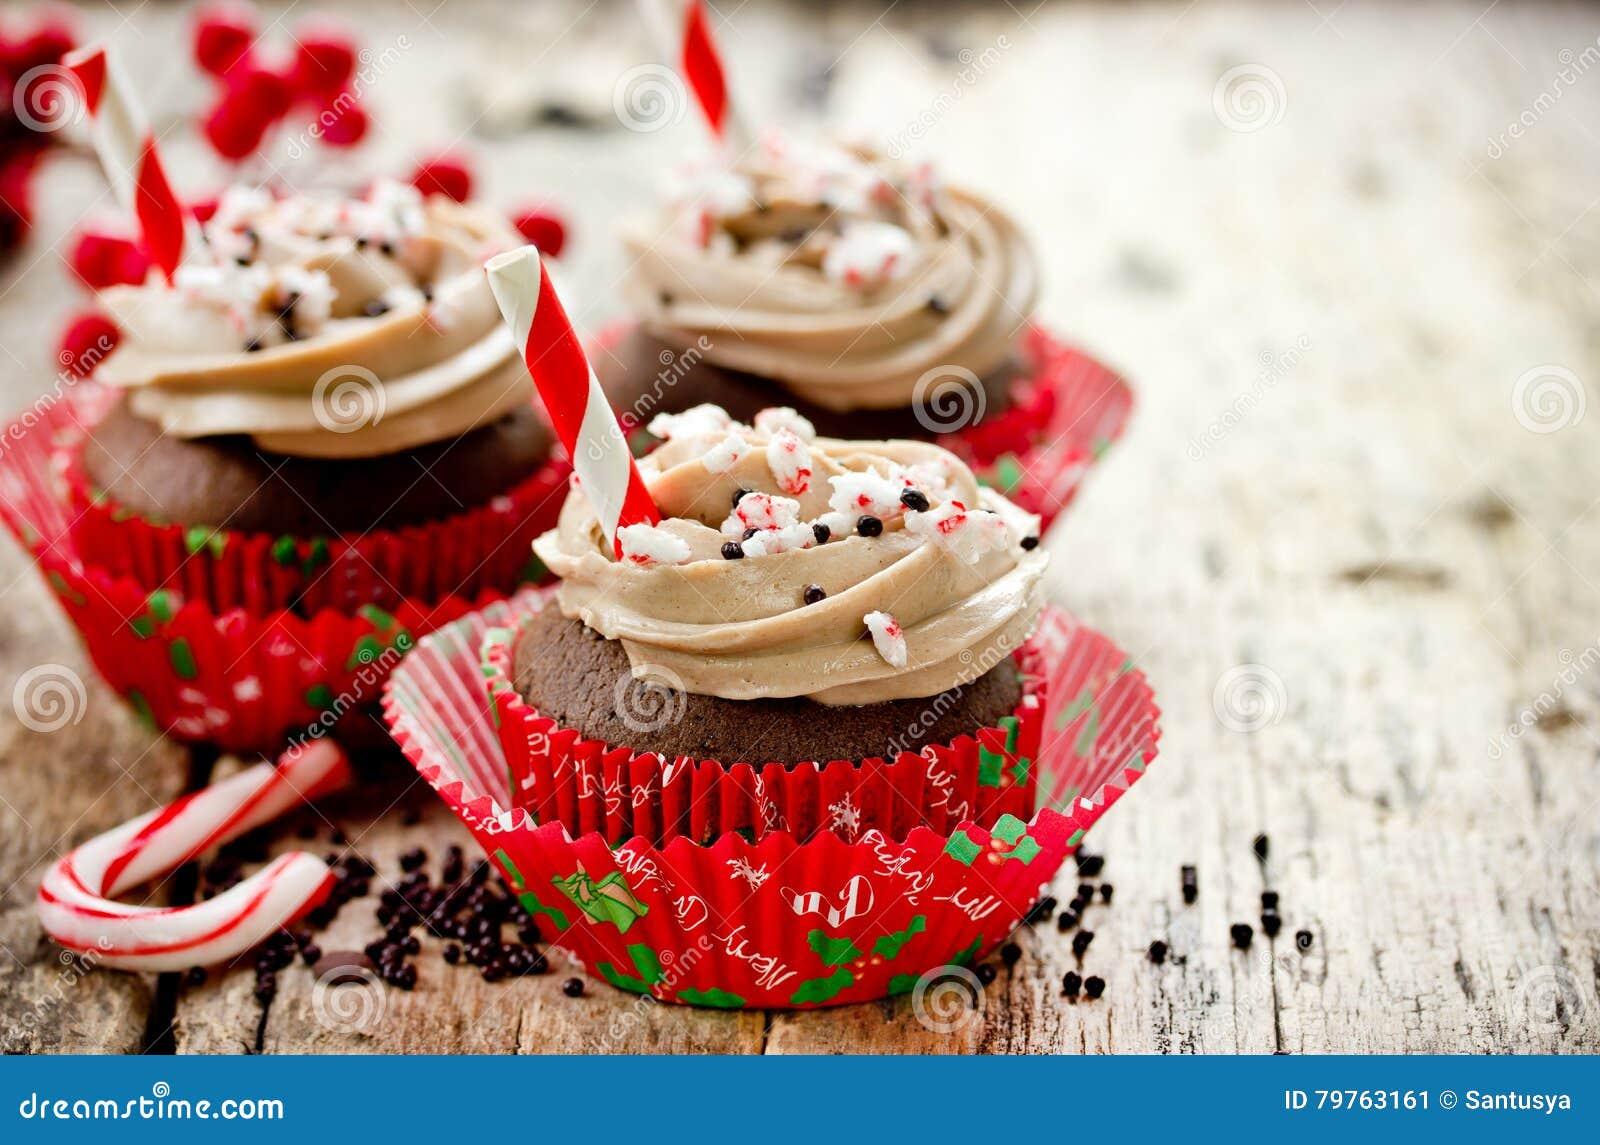 Christmas Party Dinner Menu Dessert Idea - Delicious ...